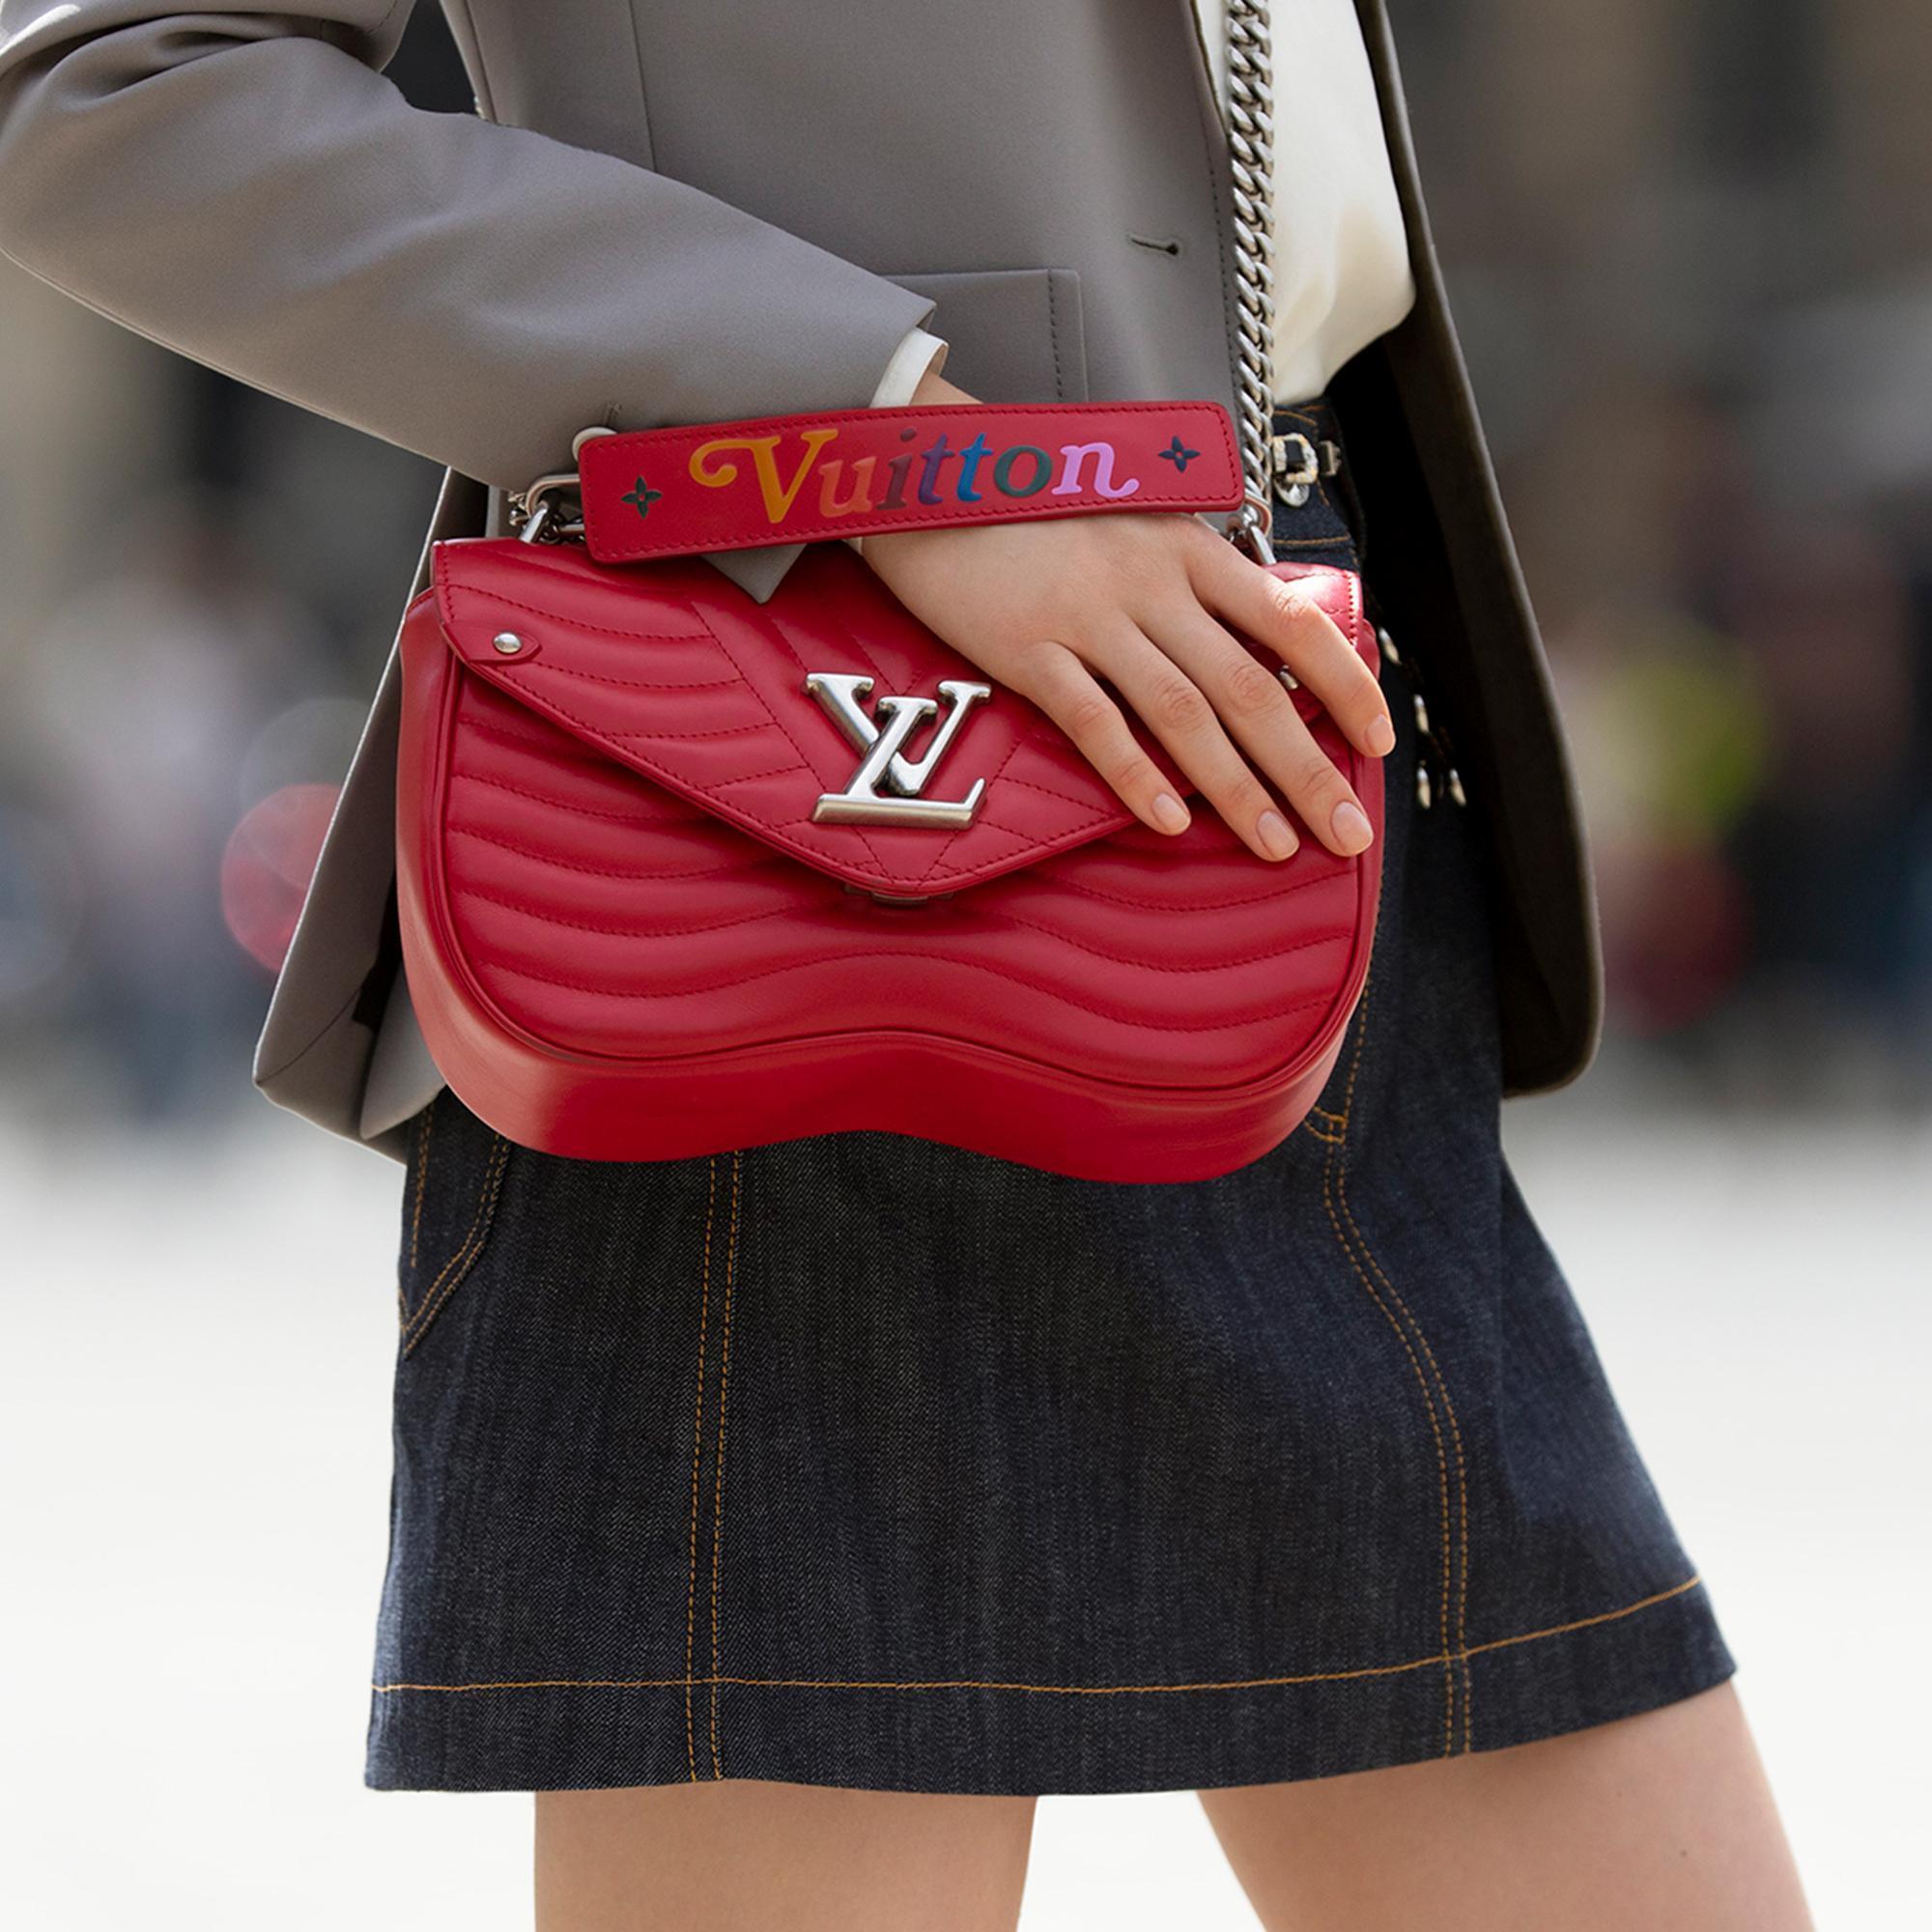 6c319dccfa51 Louis Vuitton New Wave Chain Bag Pm In Ecarlate